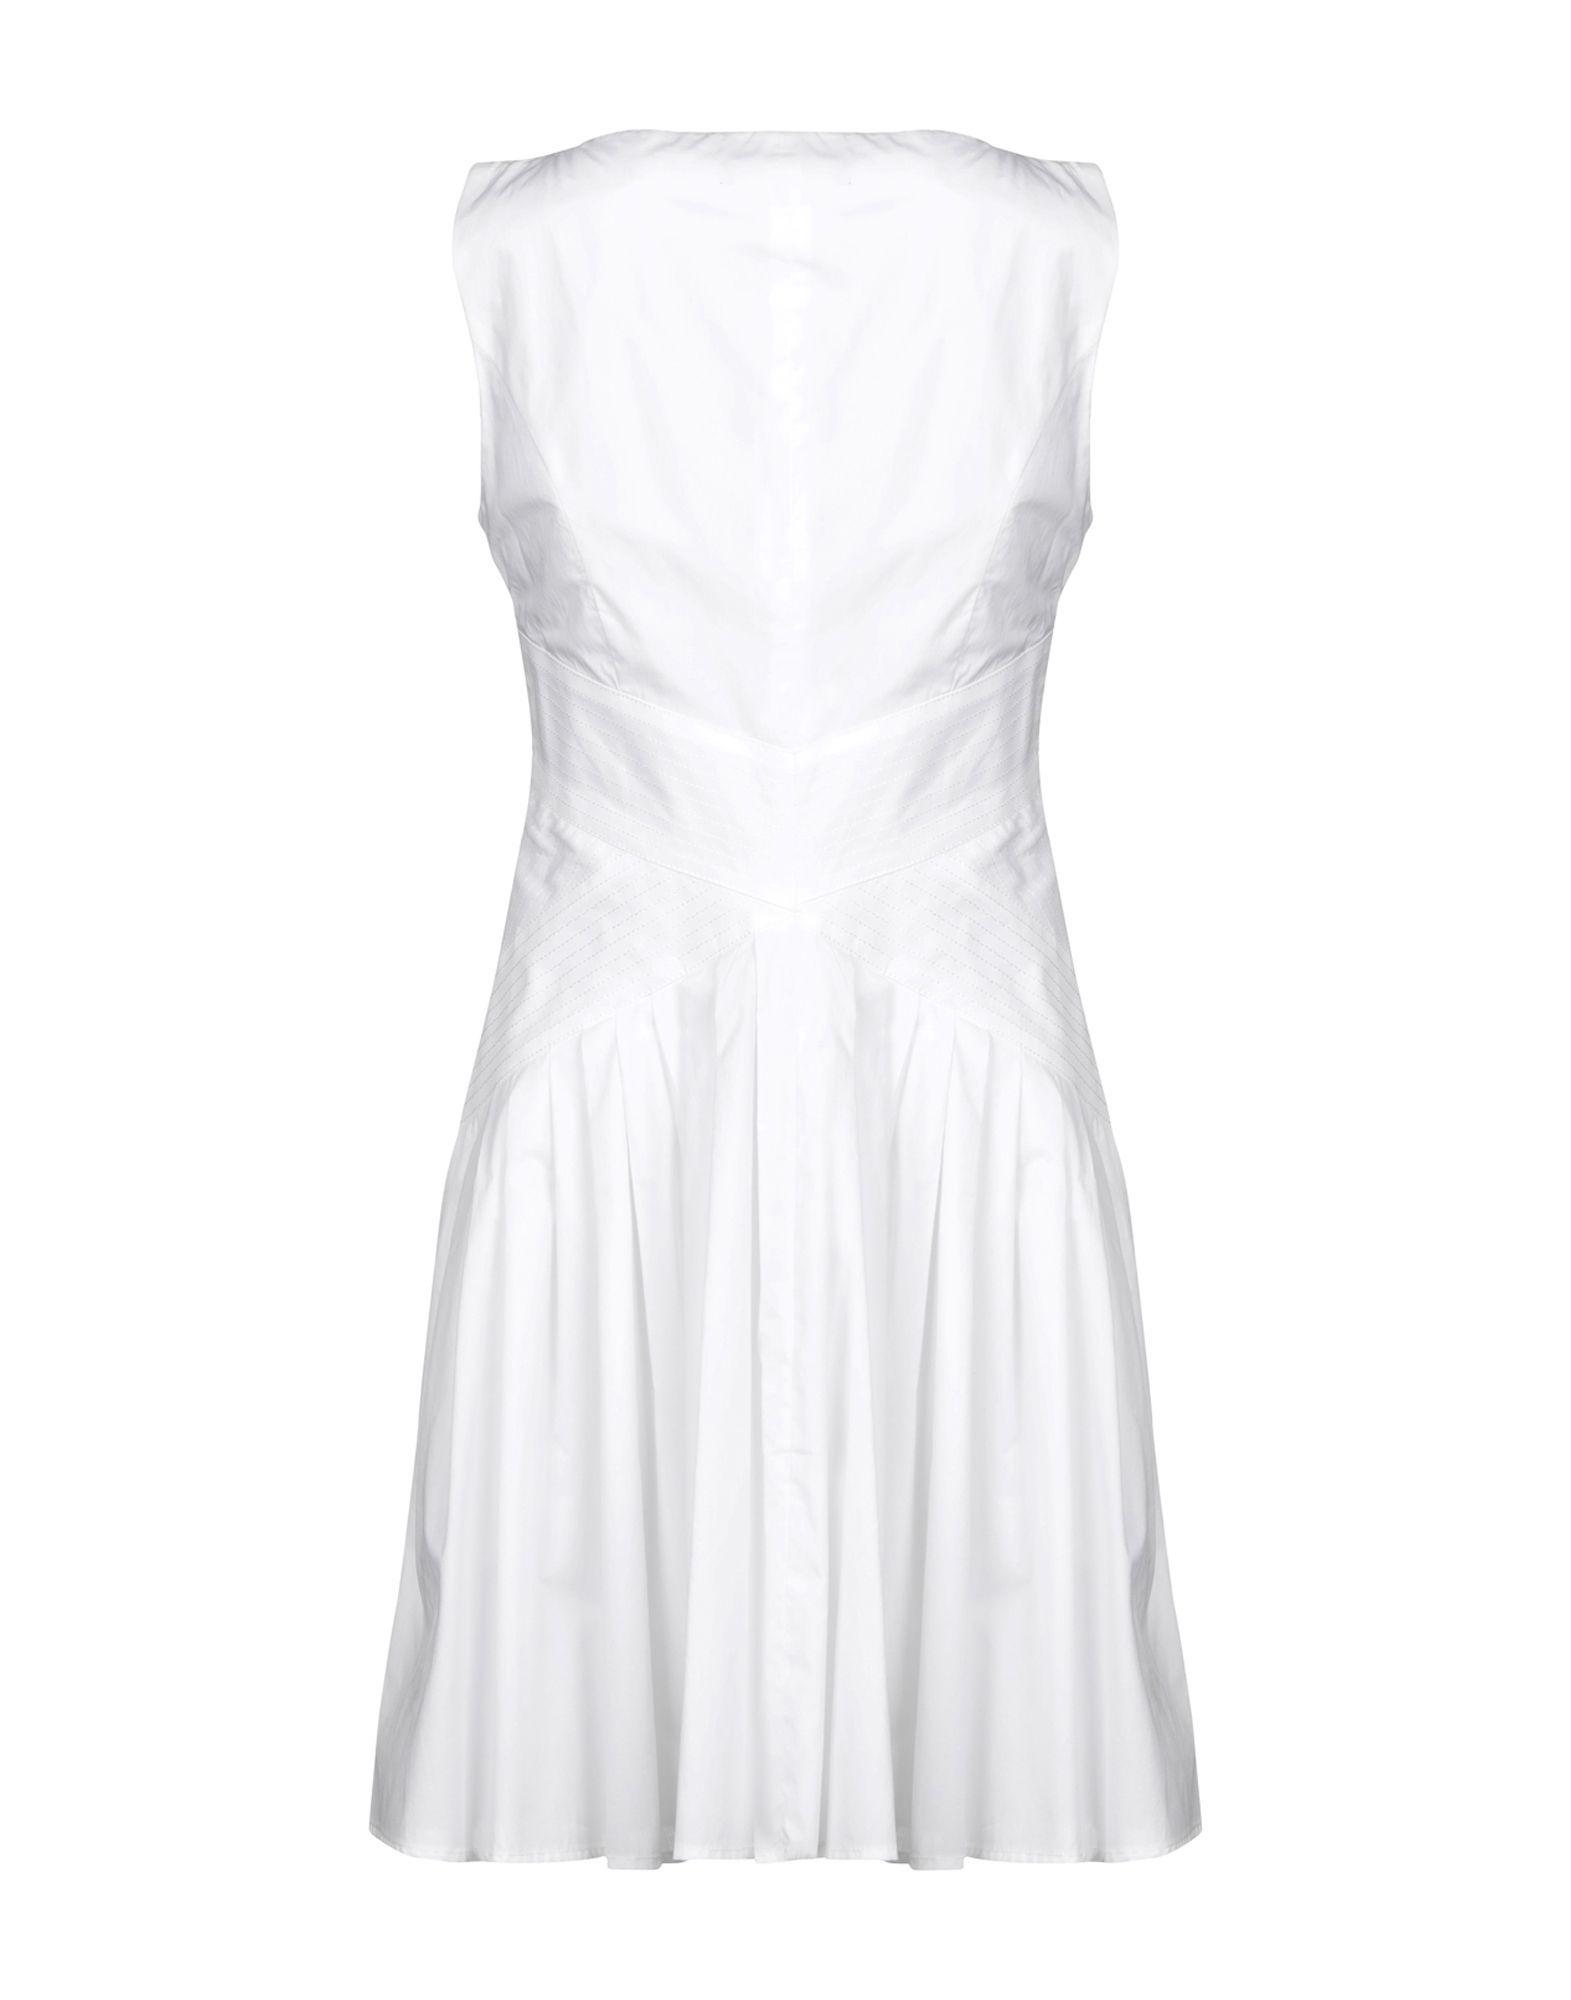 Elisabetta Franchi White Cotton Short Dress